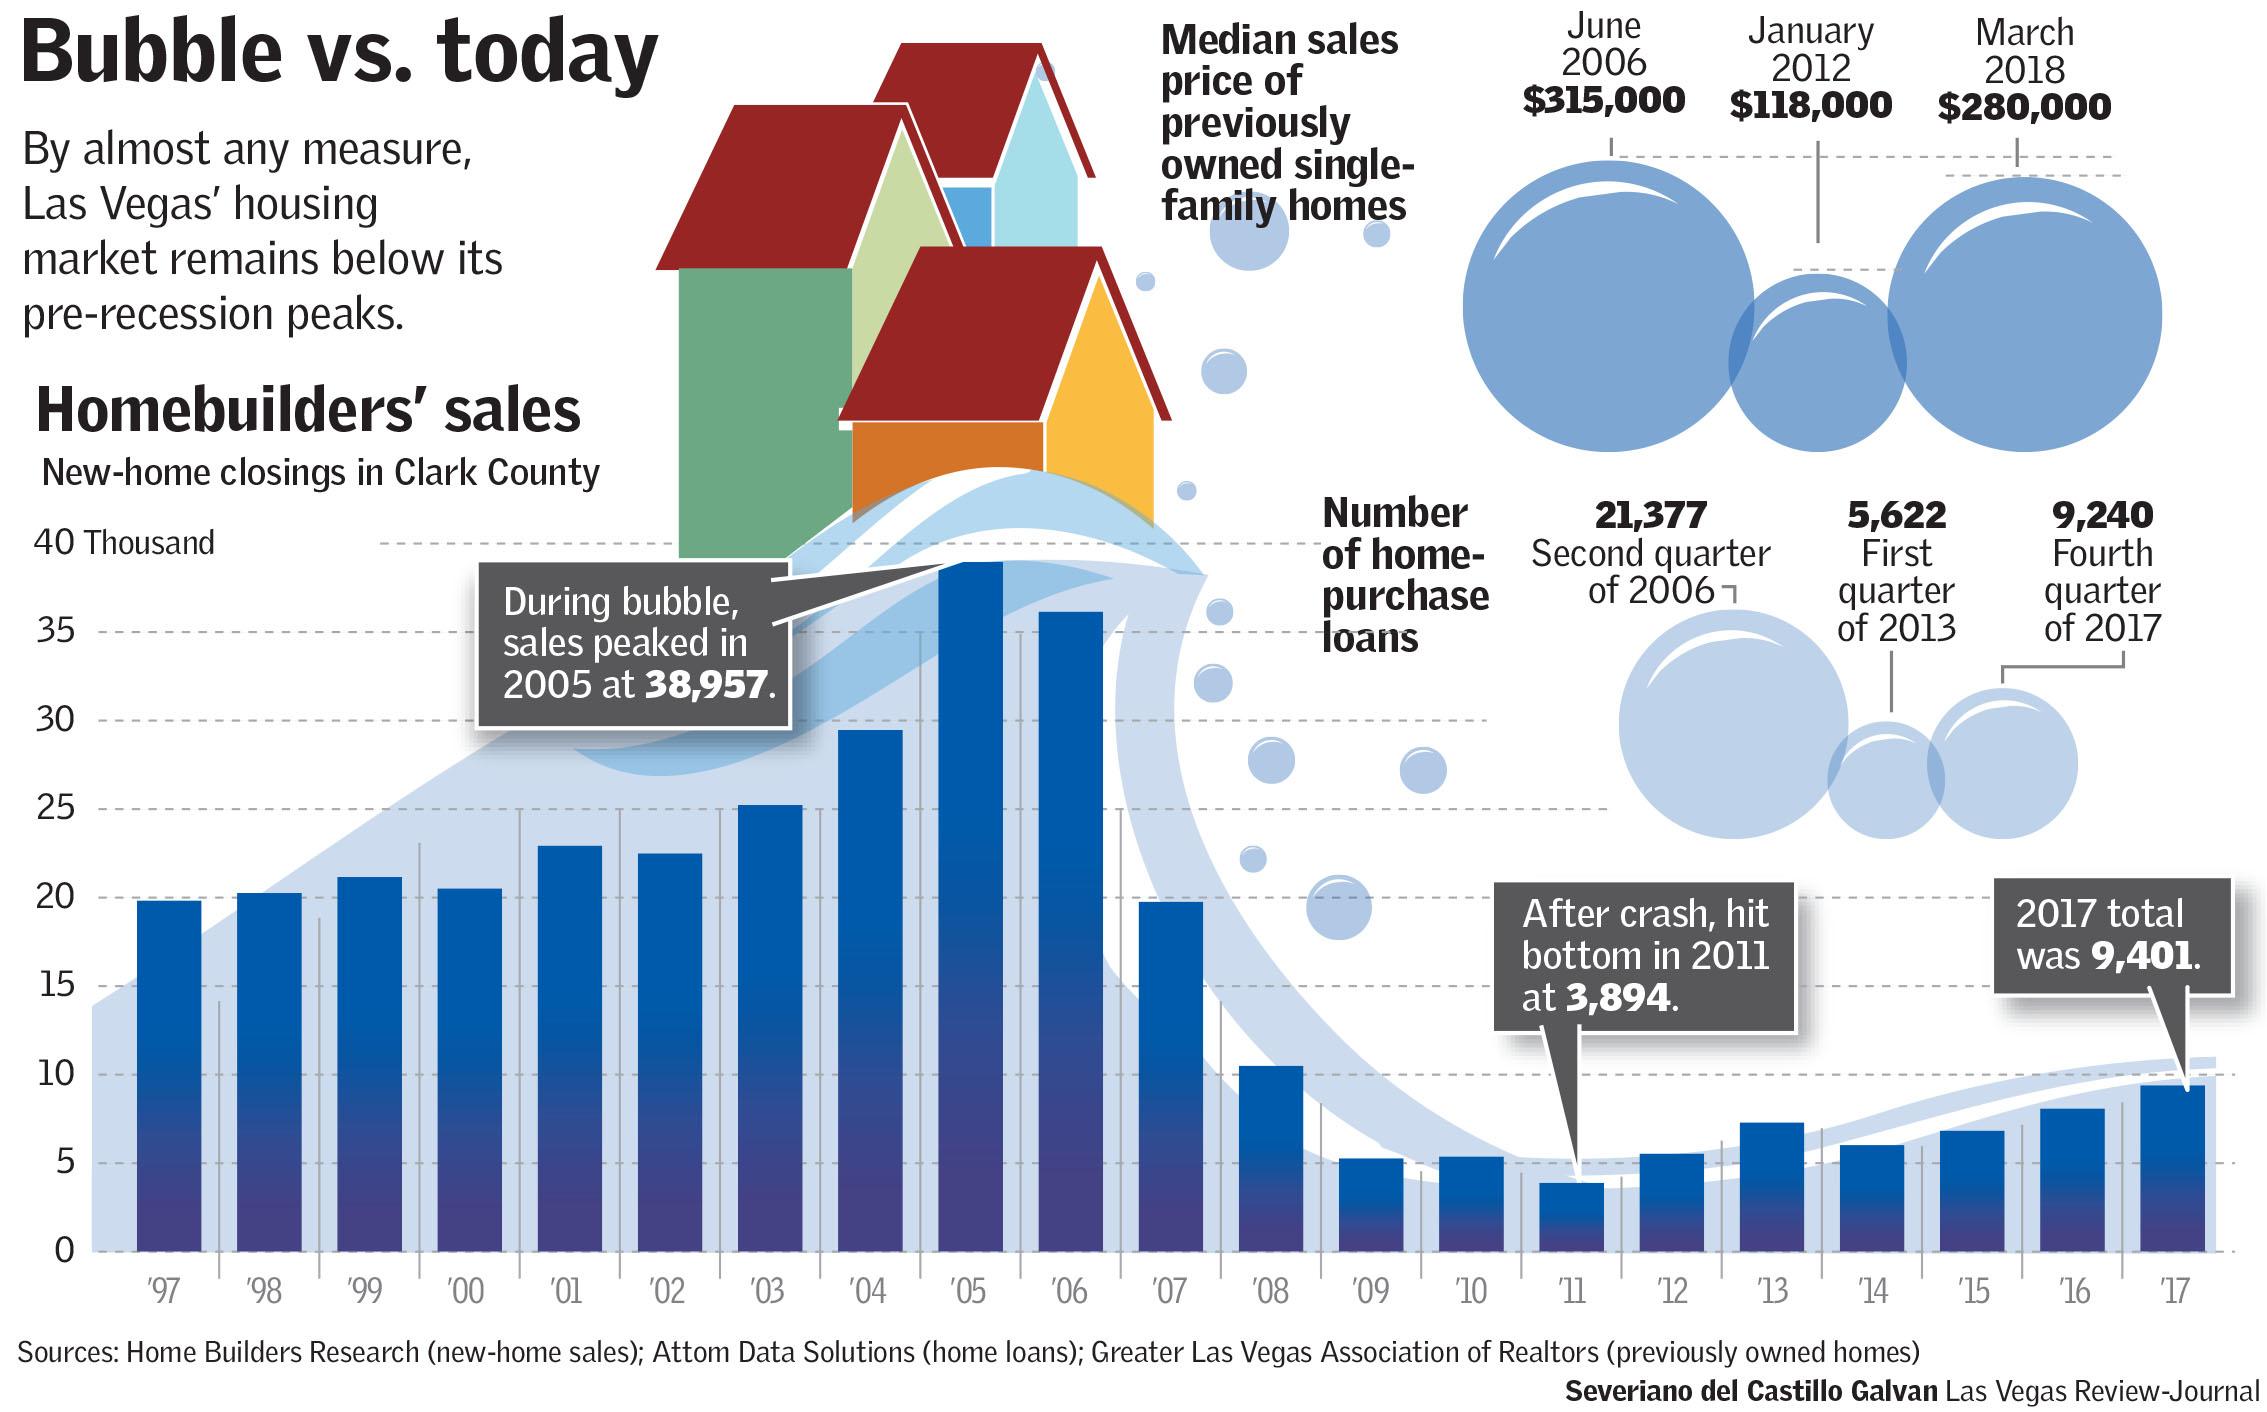 Bubble vs. today